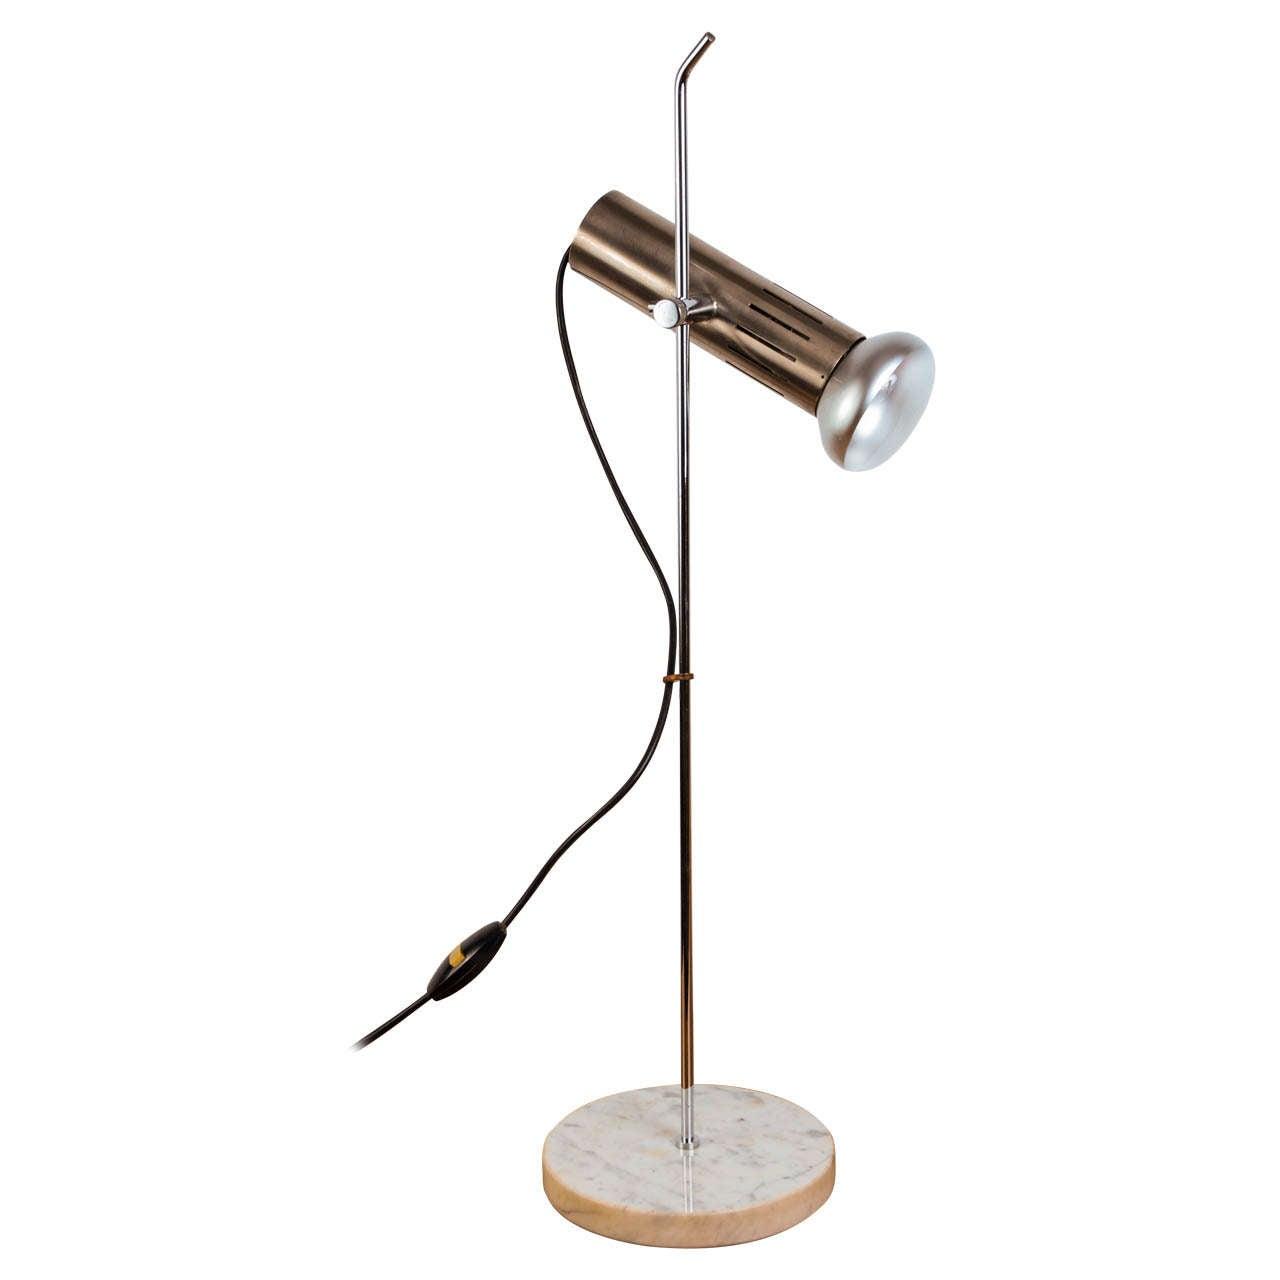 Lamp A4L - Alain Richard - Pierre Disderot Edition - 1958 1